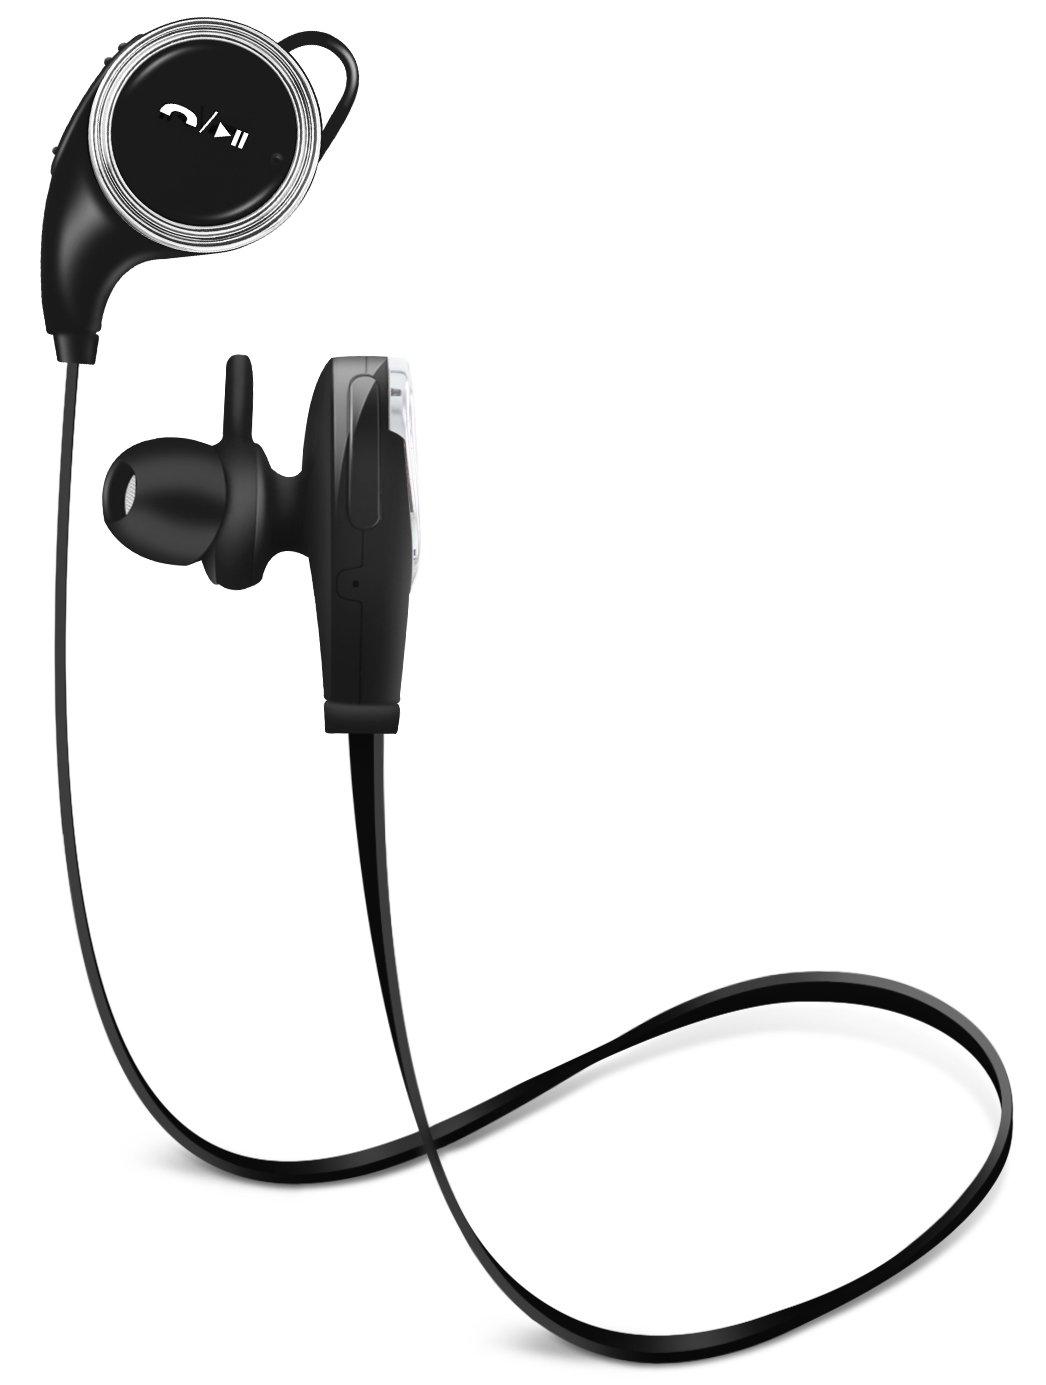 156ee37175b Aduro Amplify SBC10 Sweatproof Wireless Bluetooth Sport Headset w/ Noise  Cancelling Tech, Ergonomic Design